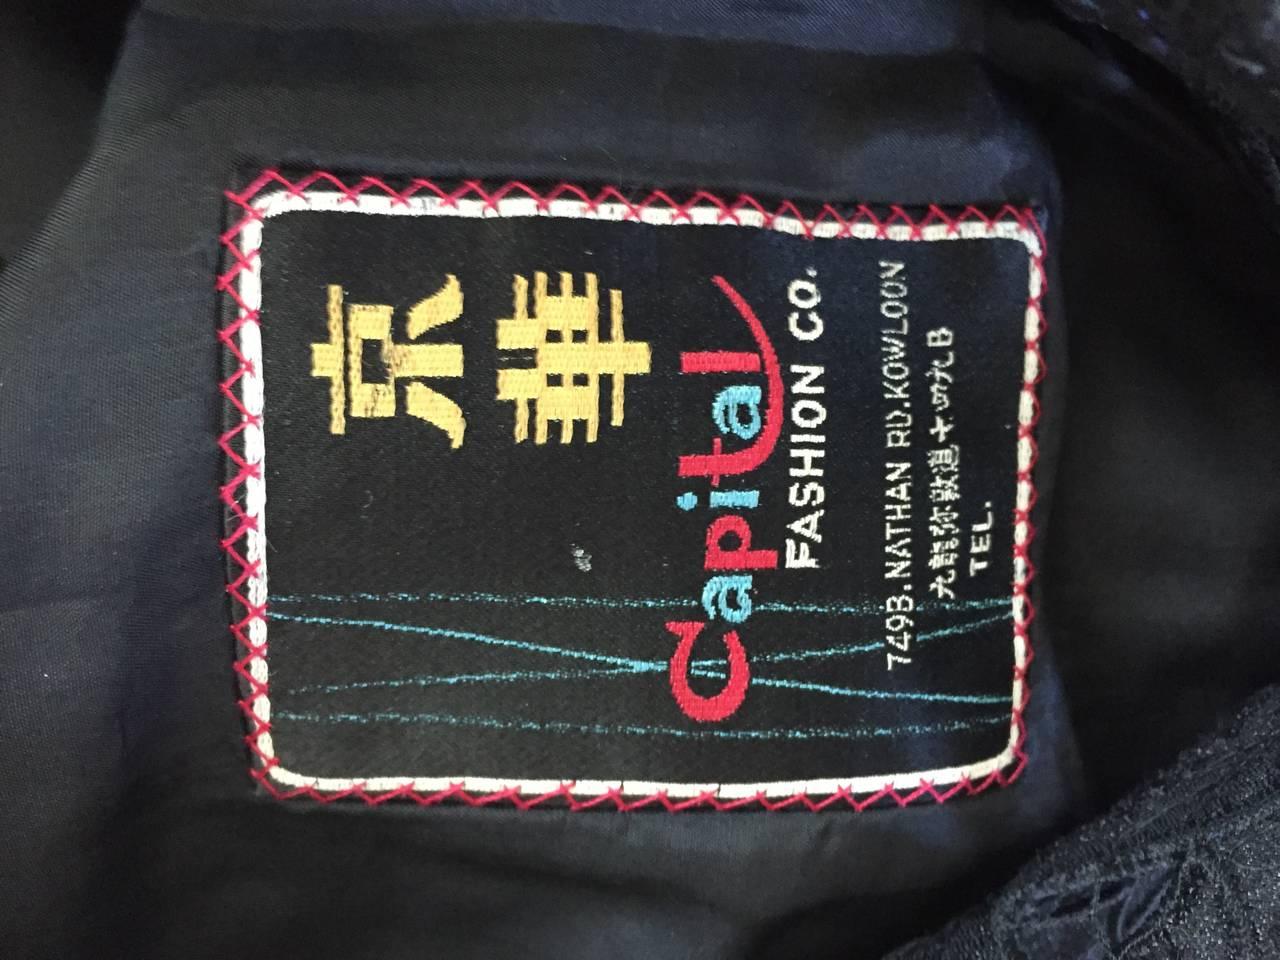 Chic 1940s Black Duster / Opera Jacket w/ Crochet Details + Scalloped Edges 10